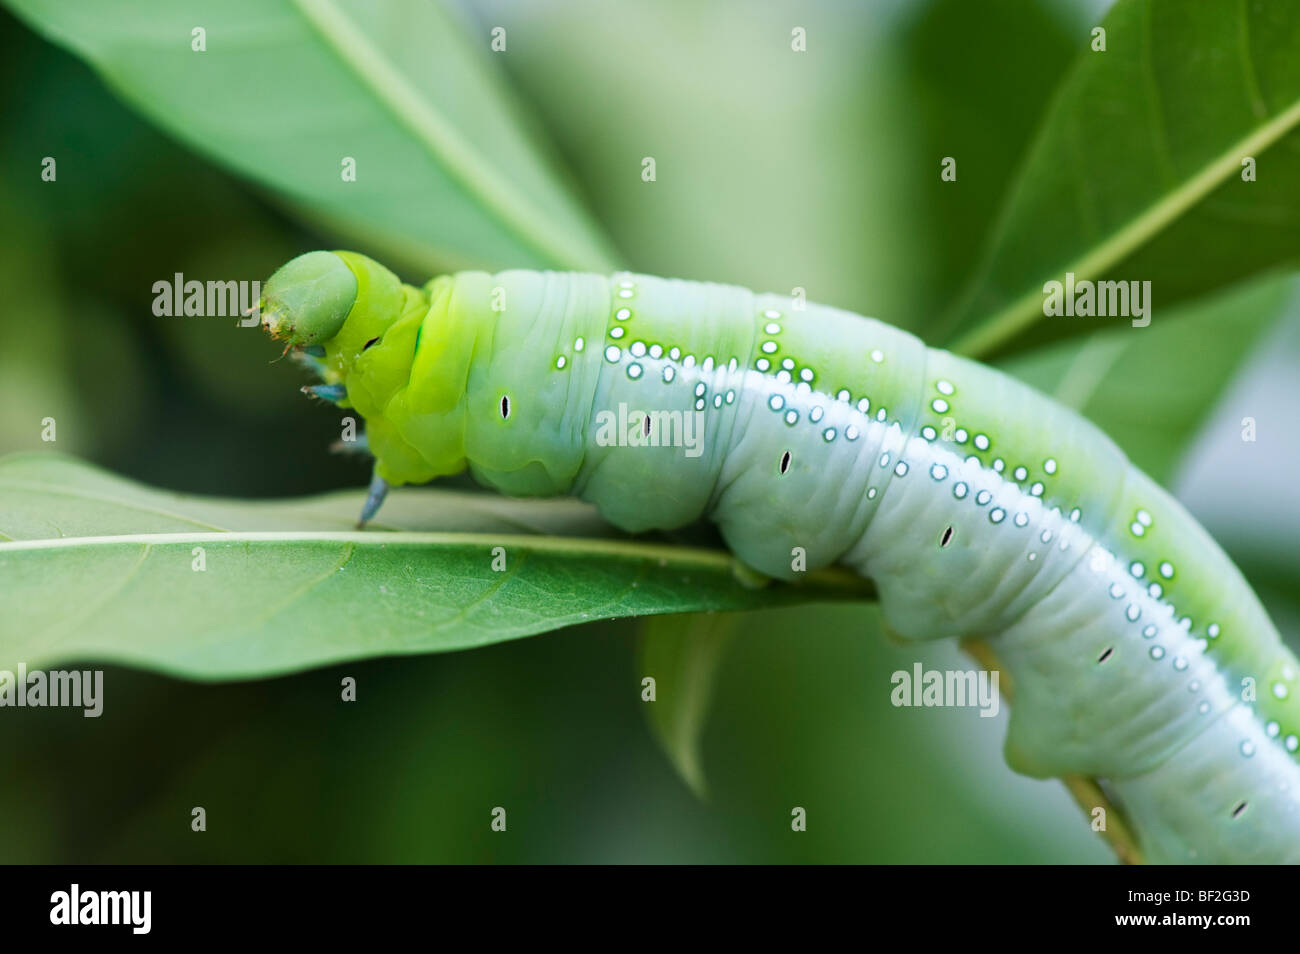 Dafnis nerii. Adelfa Hawk-moth caterpillar en una hoja en la India Foto de stock